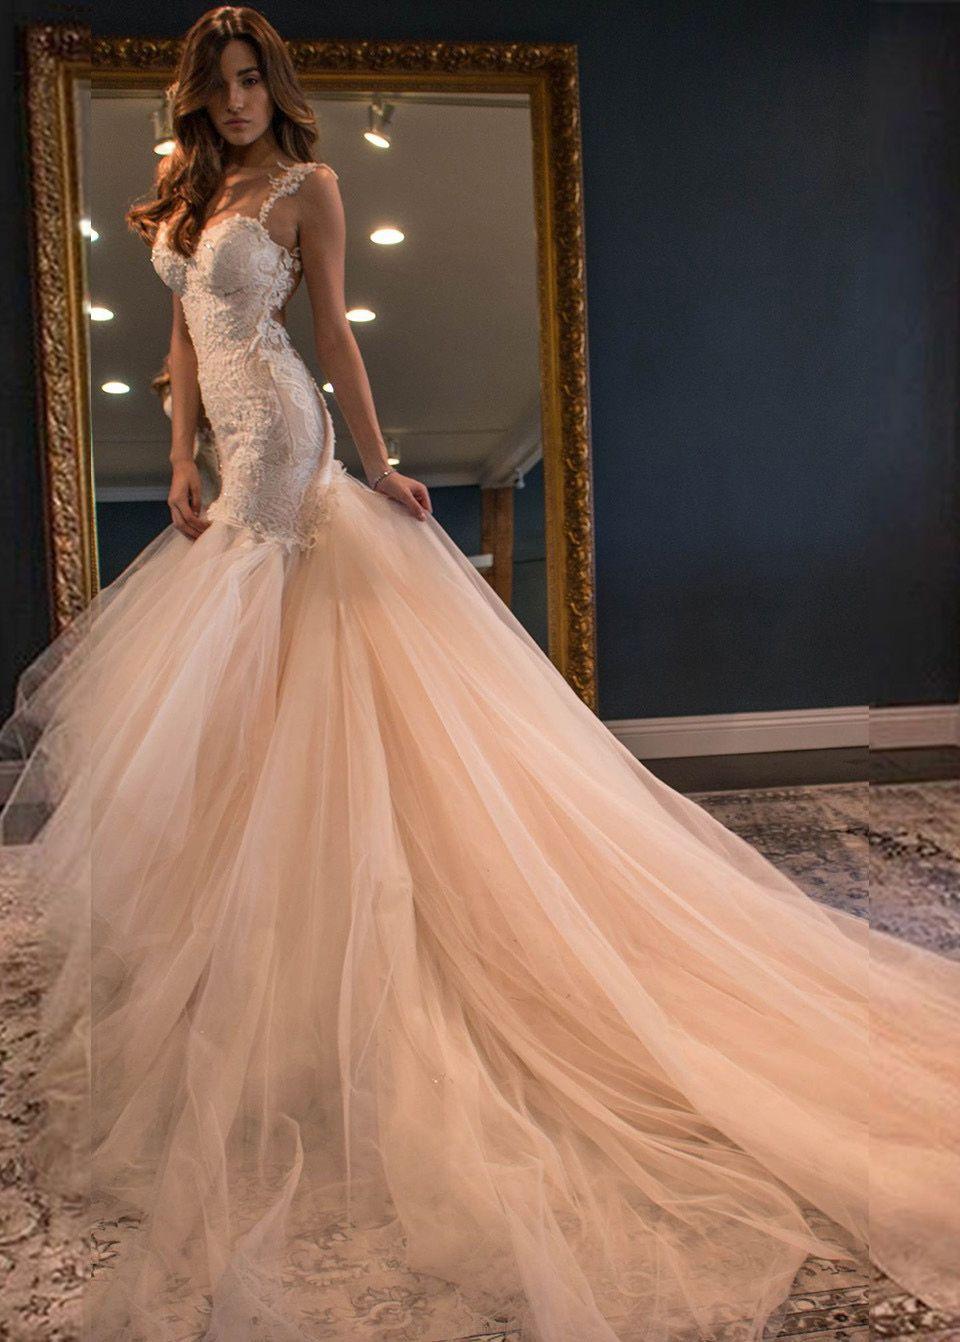 Long prom dresses lace prom dresses champagne prom dresses open